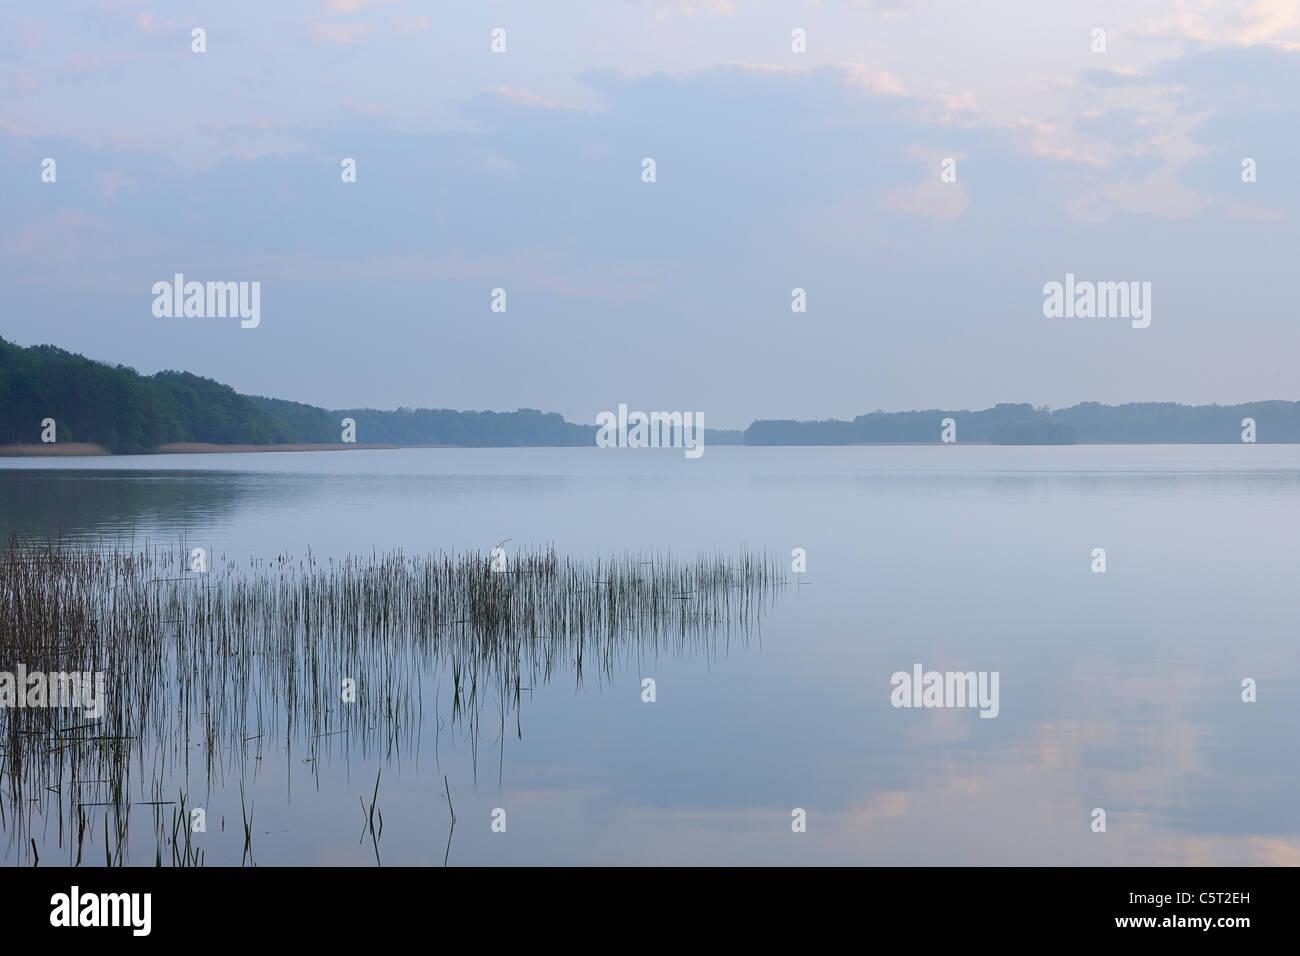 Germany, Mecklenburg-Vorpommern, Mecklenburger Seenplatte, Plau am See, View of moody sky at lake - Stock Image